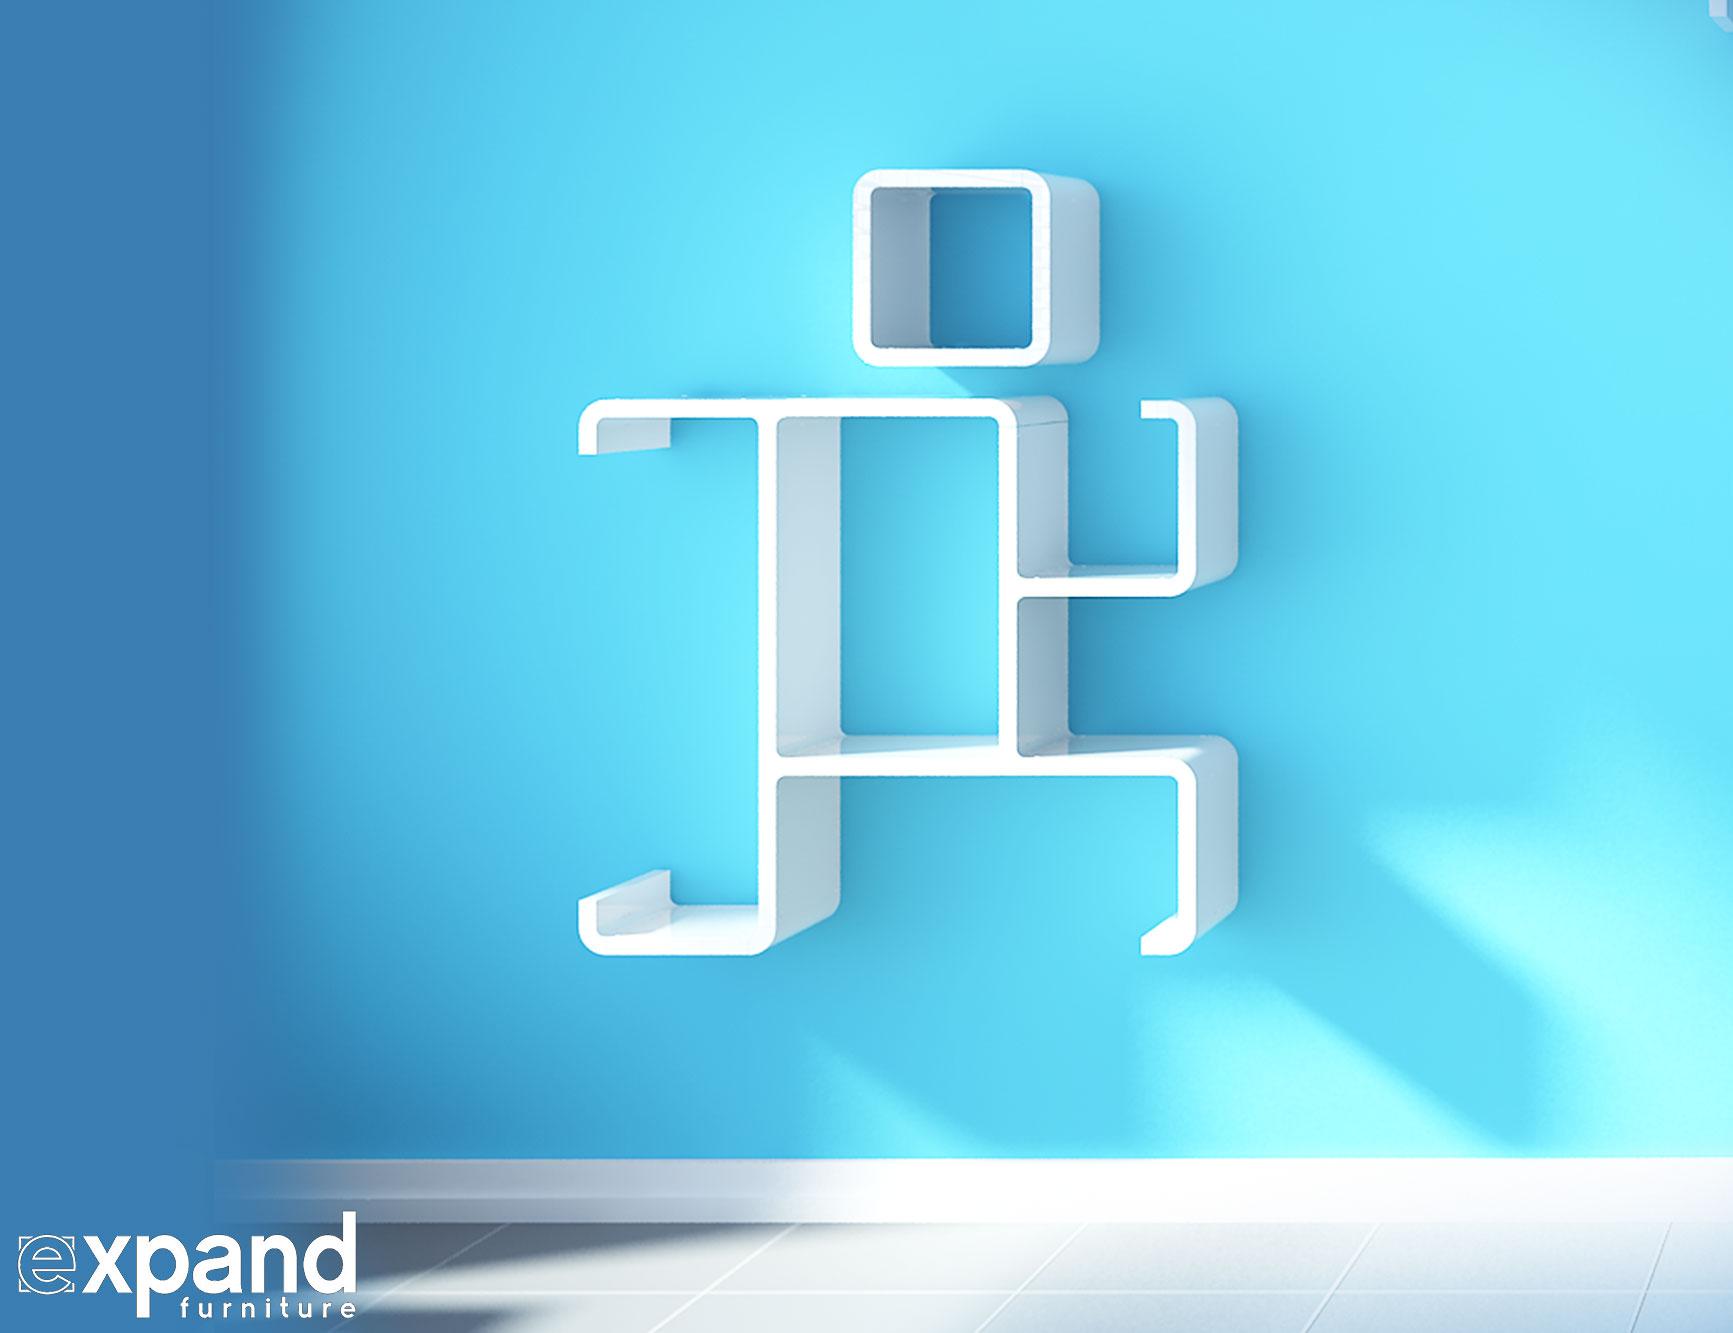 Running Hero Decorative Shelf Expand Furniture